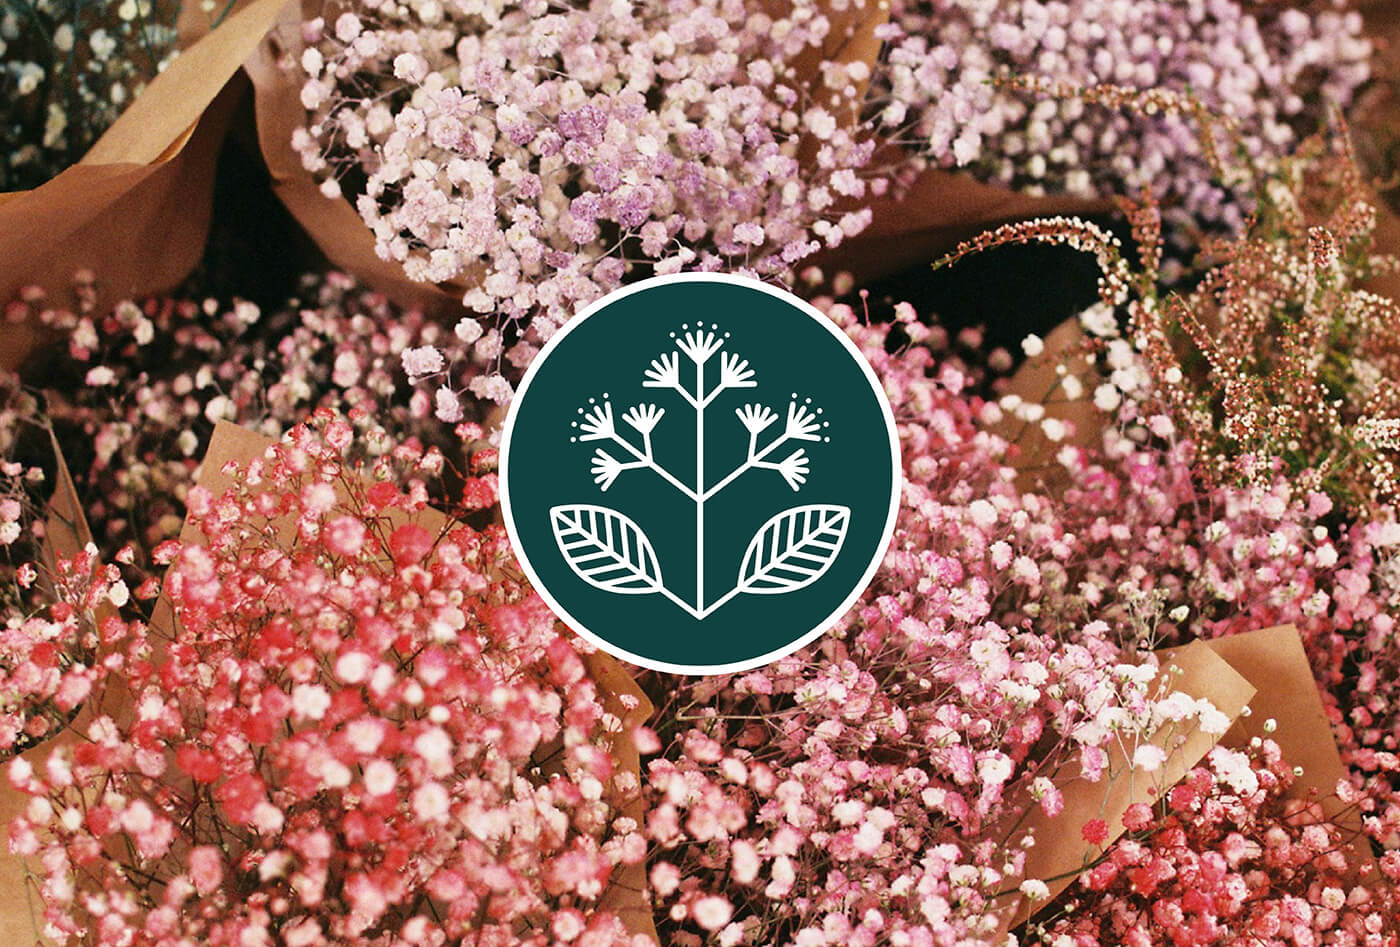 Delicate film photograph of flowers with elderflower emblem for film photographer